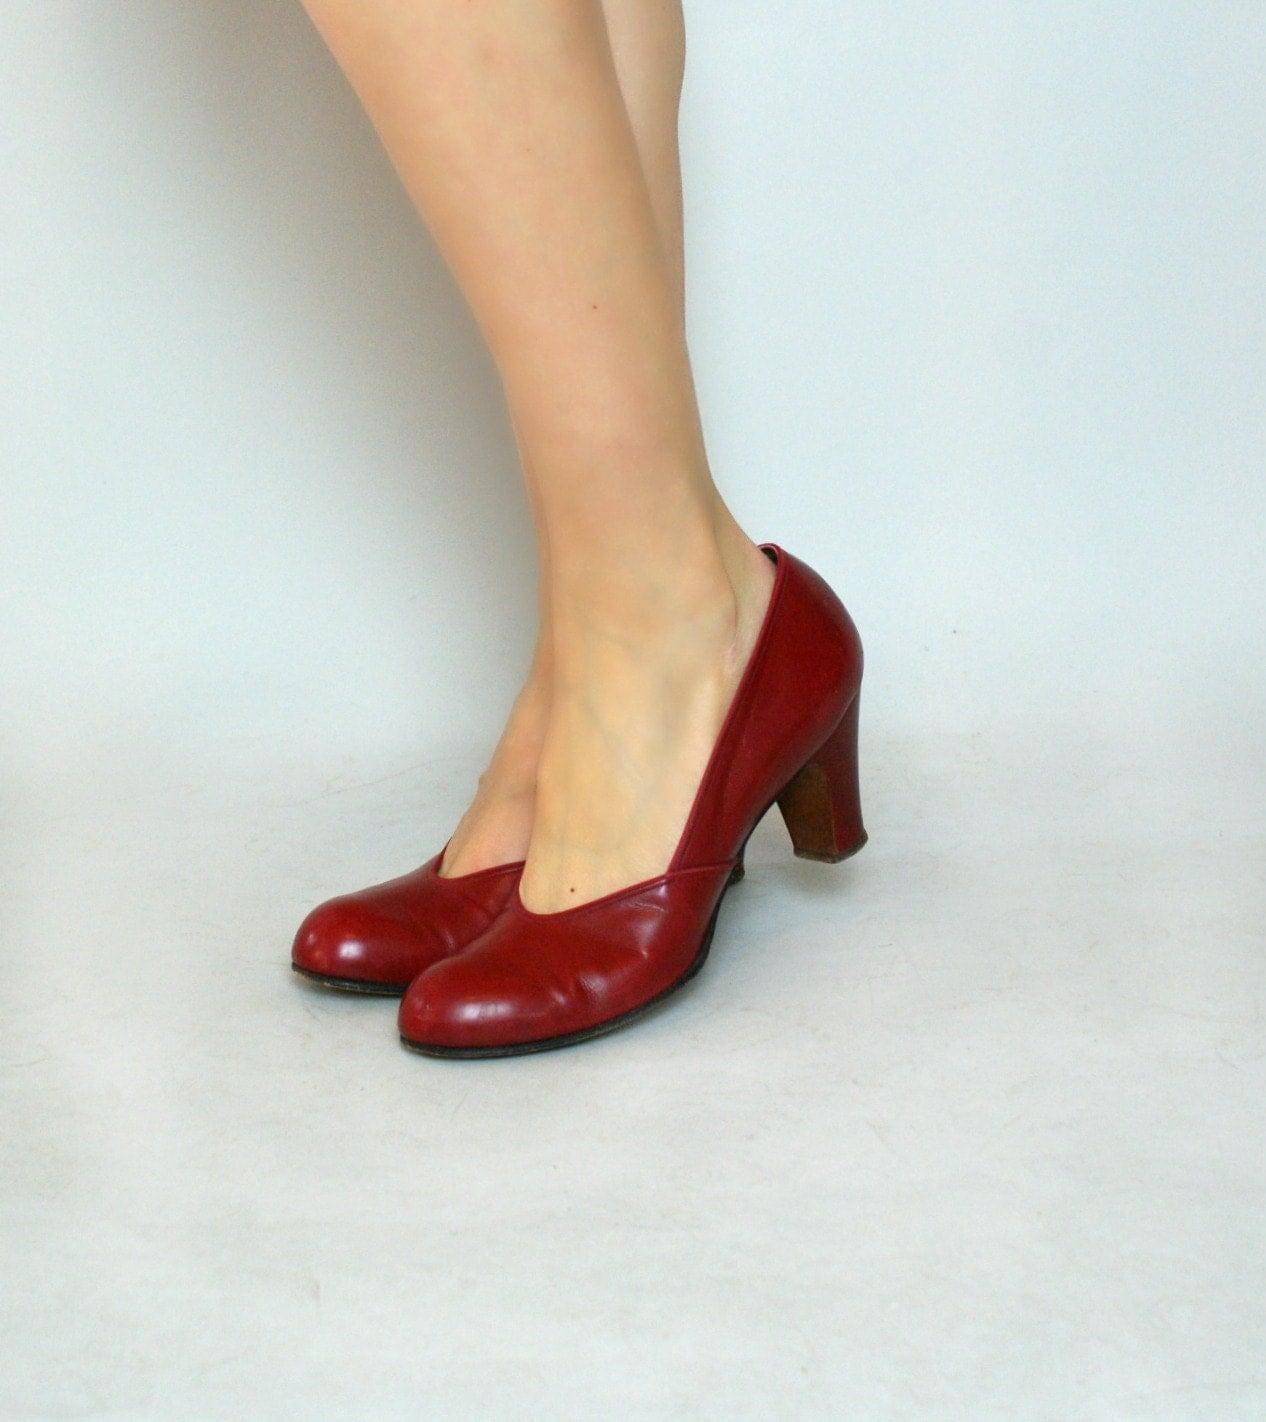 Vintage 1940s High Heels 40s Red Leather BabyDolls 7.5